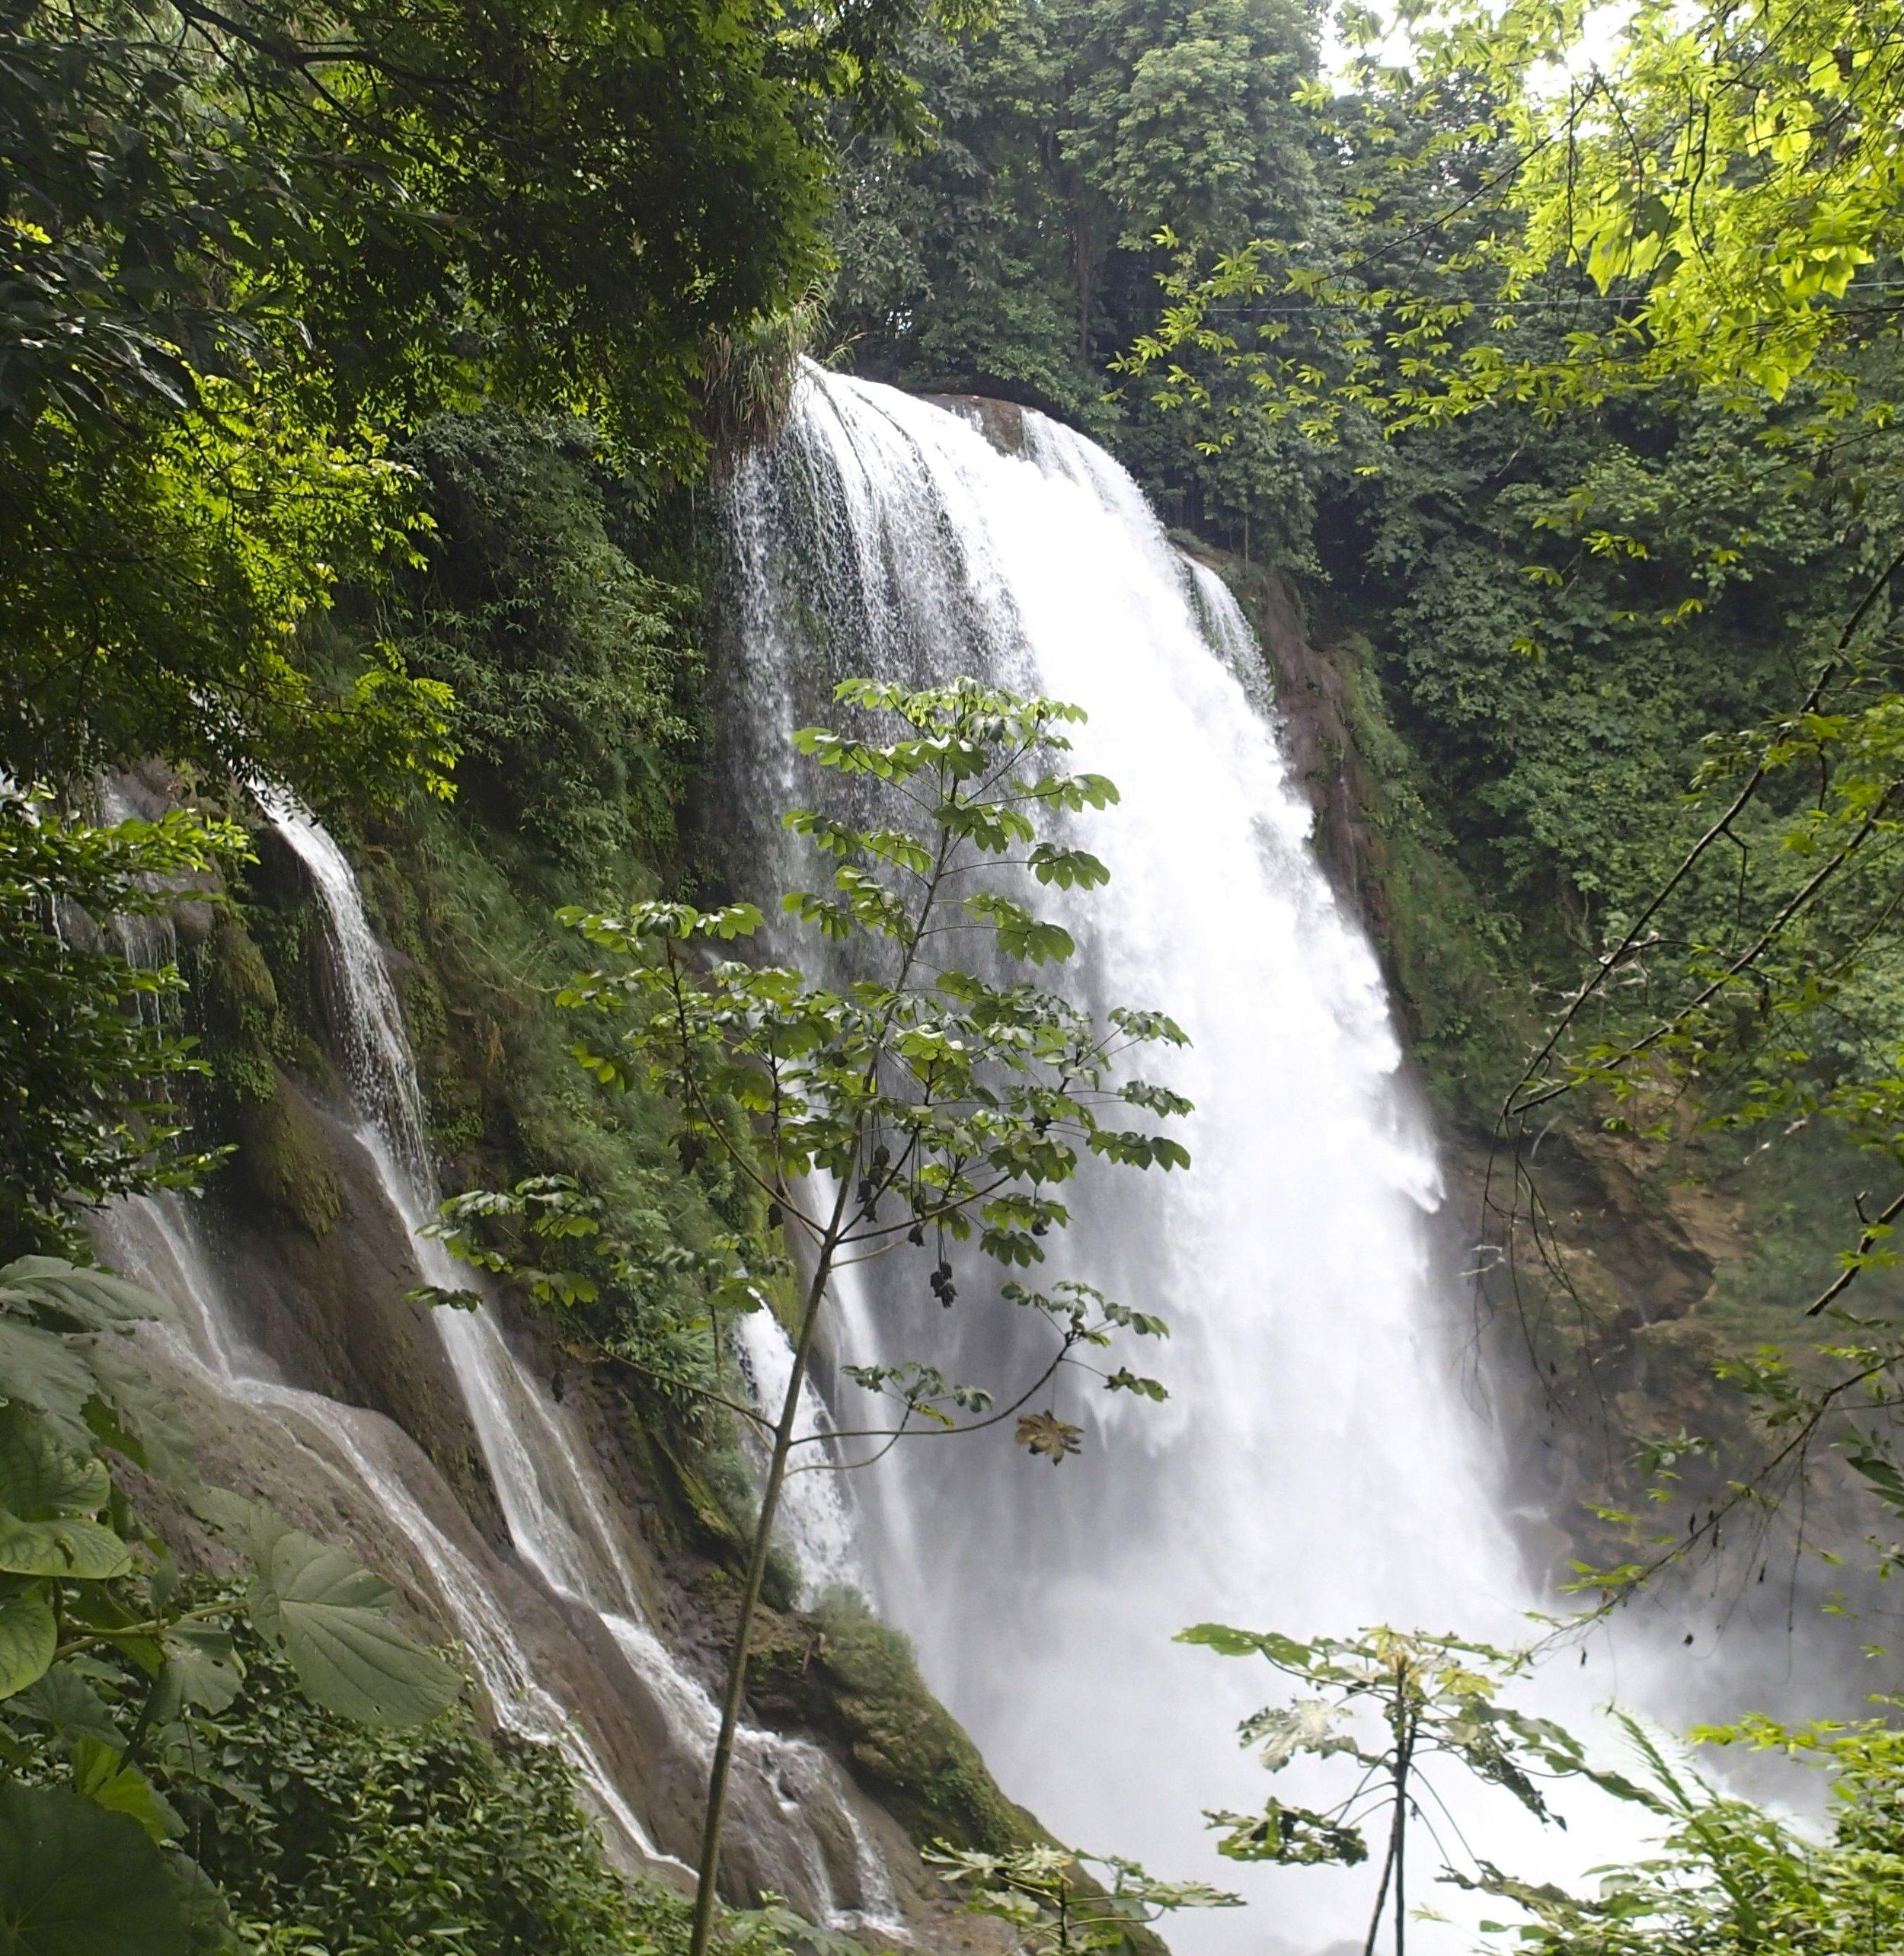 Pulhapanzak falls 12-20-13.jpg